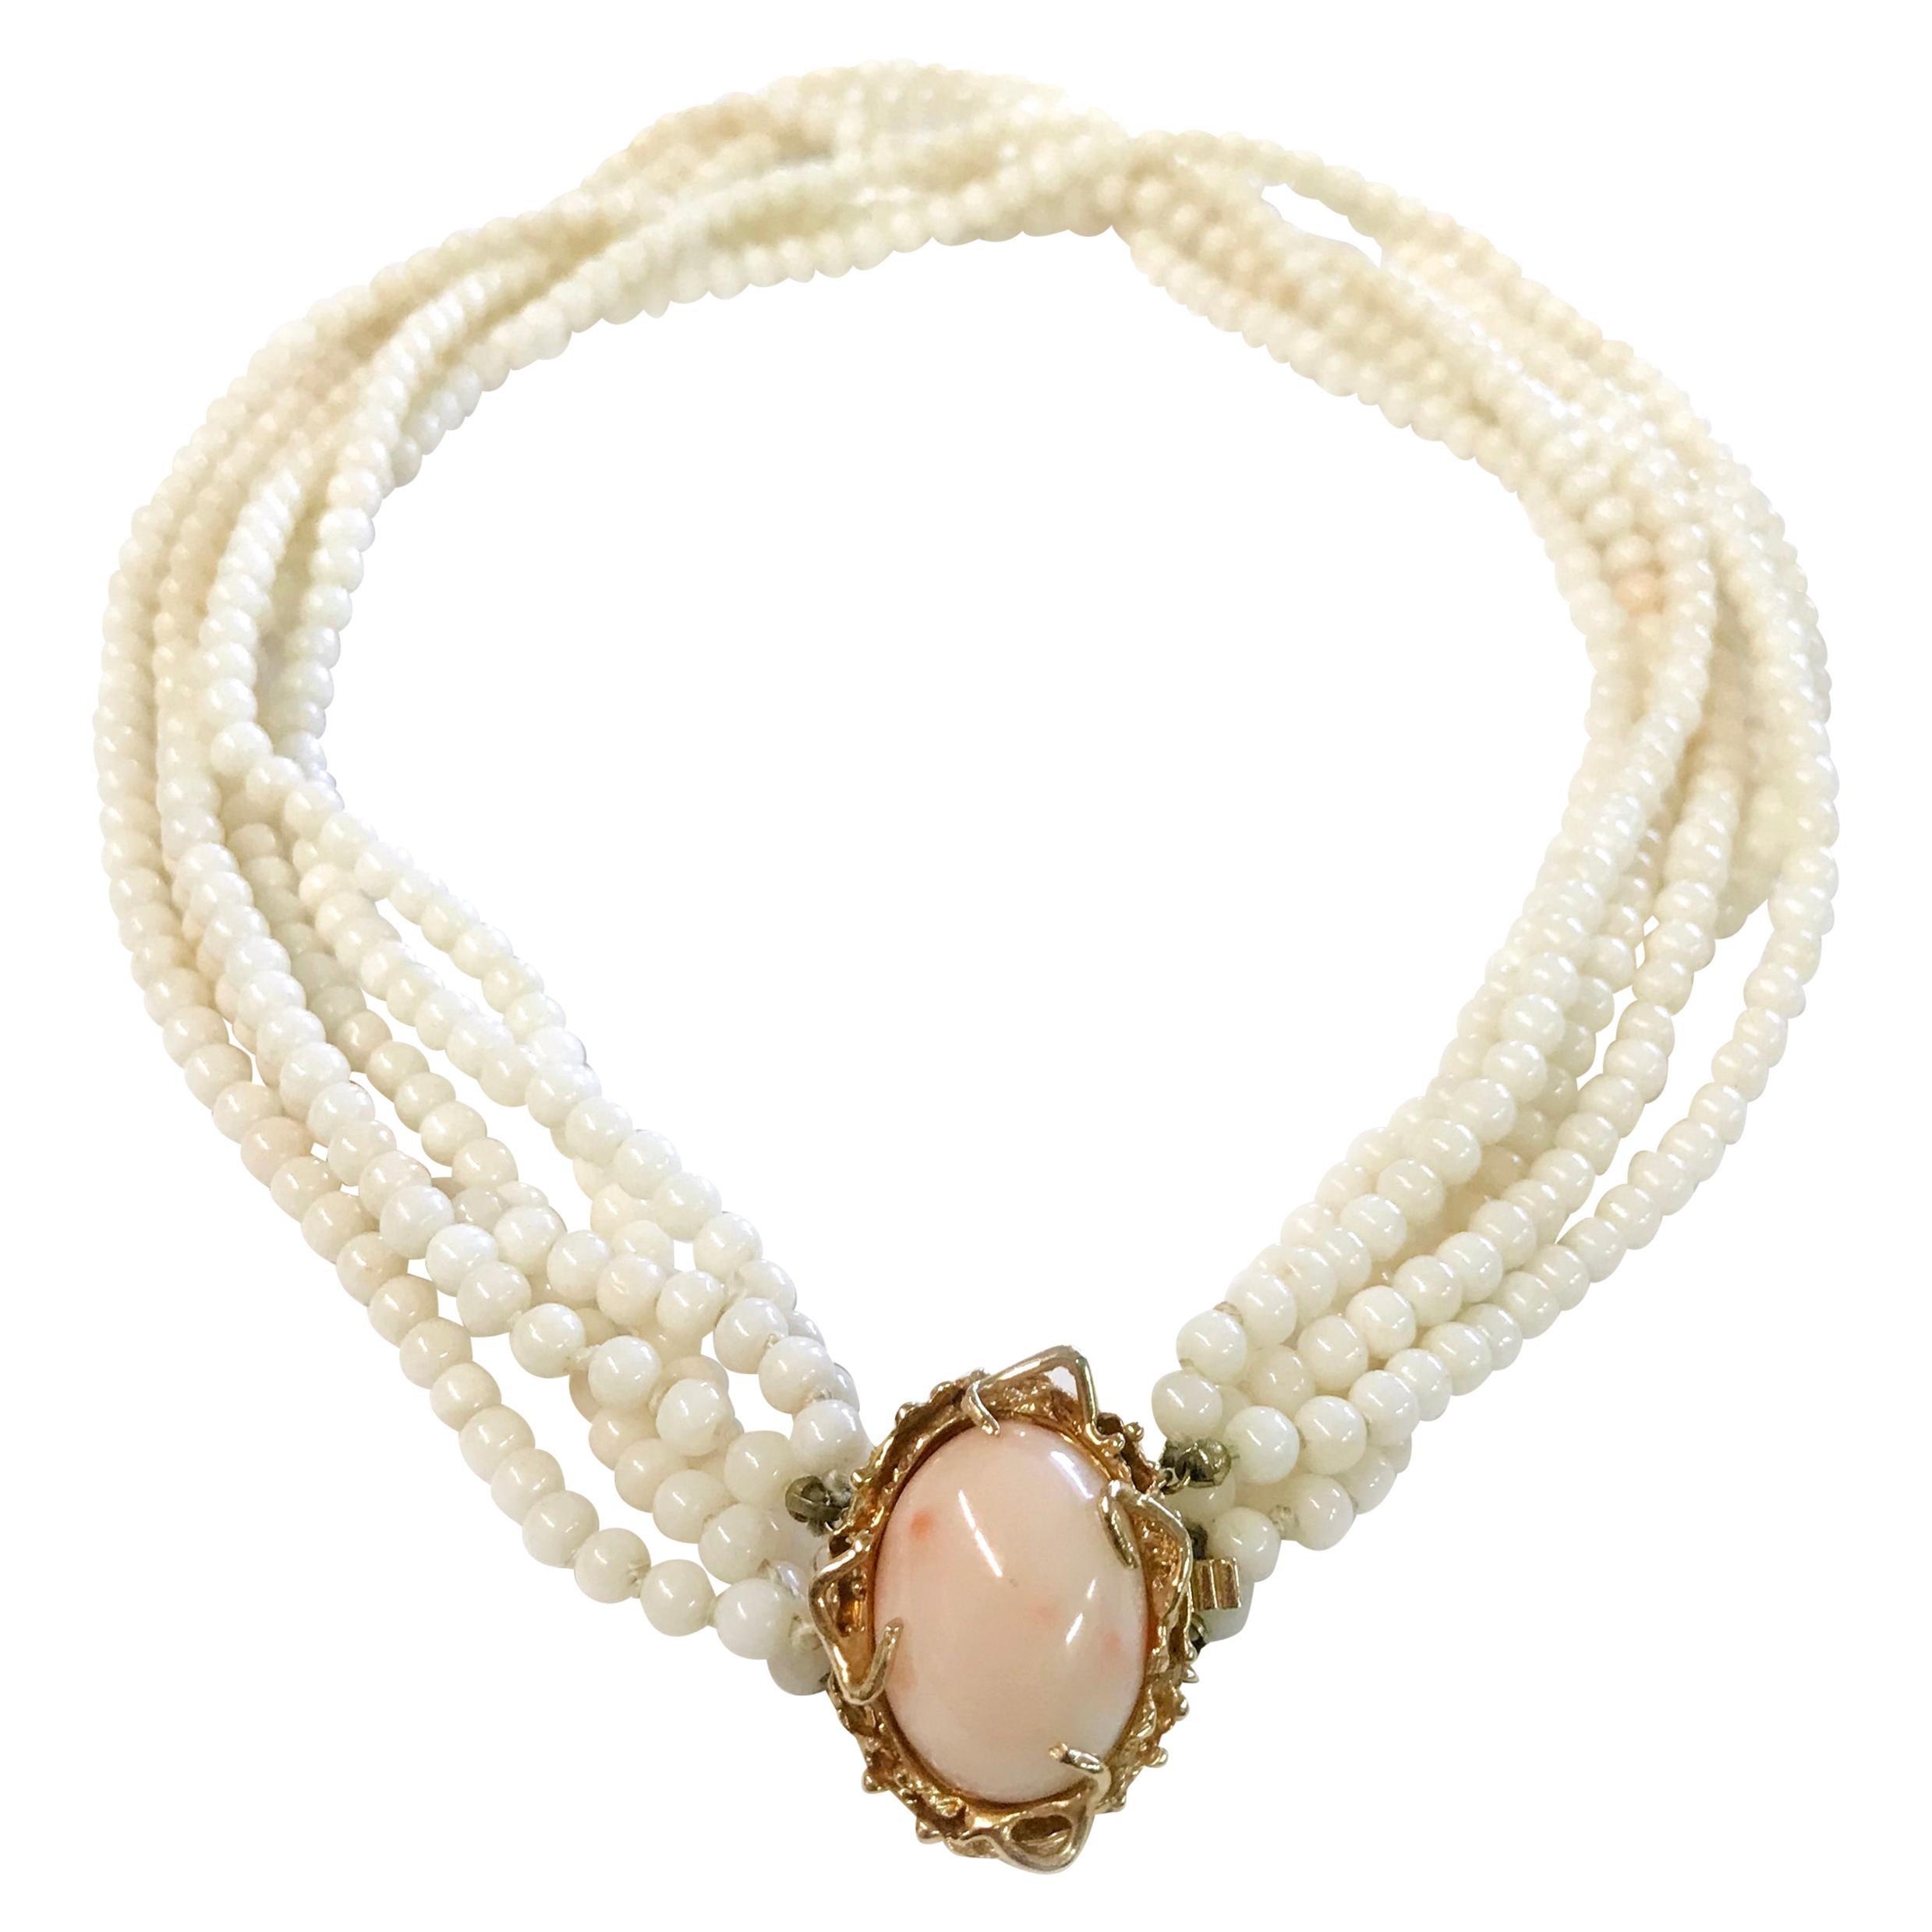 14 Karat Angel Skin Coral Choker Necklace